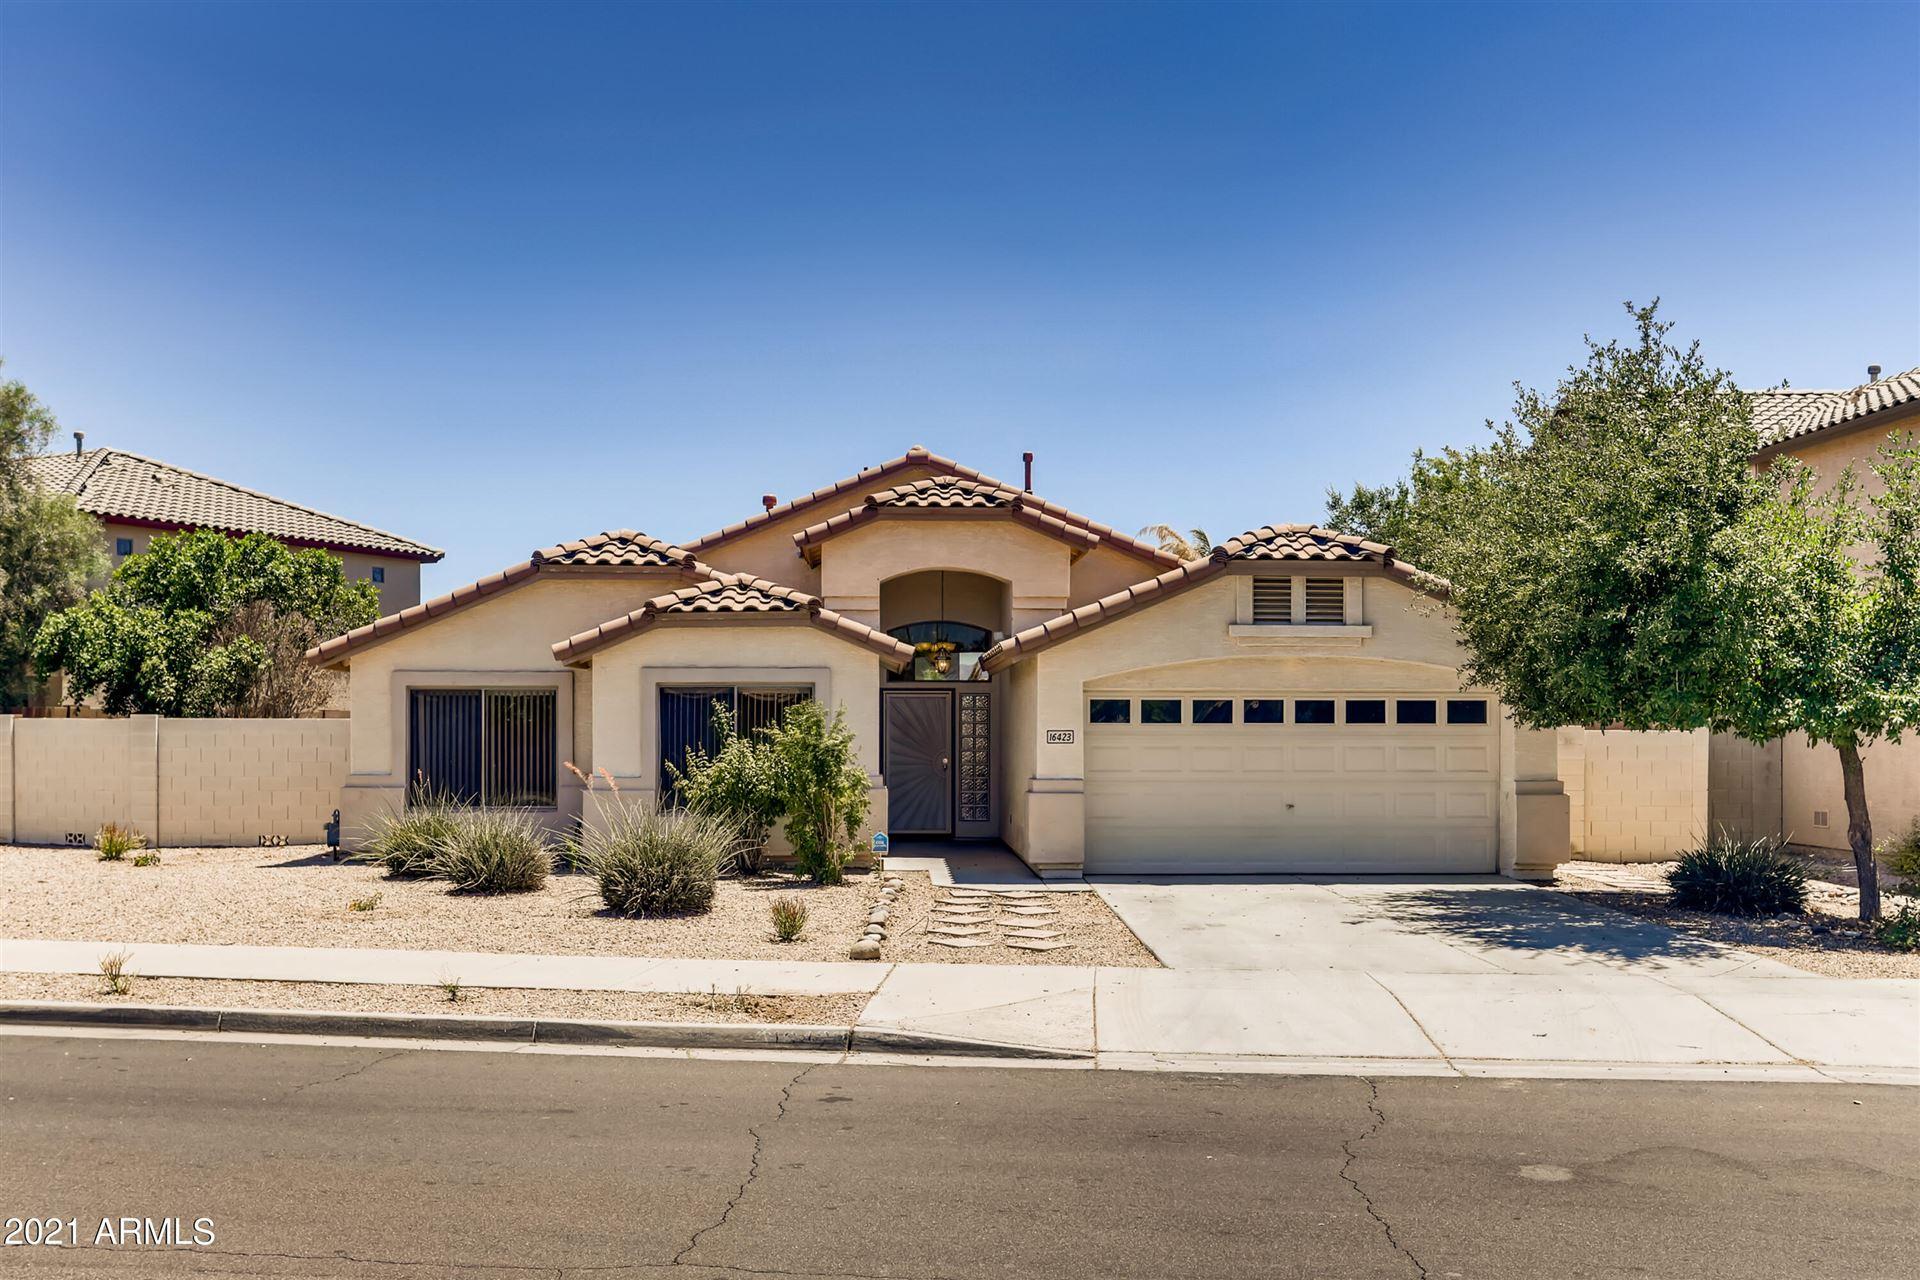 Photo of 16423 W WOODLANDS Avenue, Goodyear, AZ 85338 (MLS # 6248961)